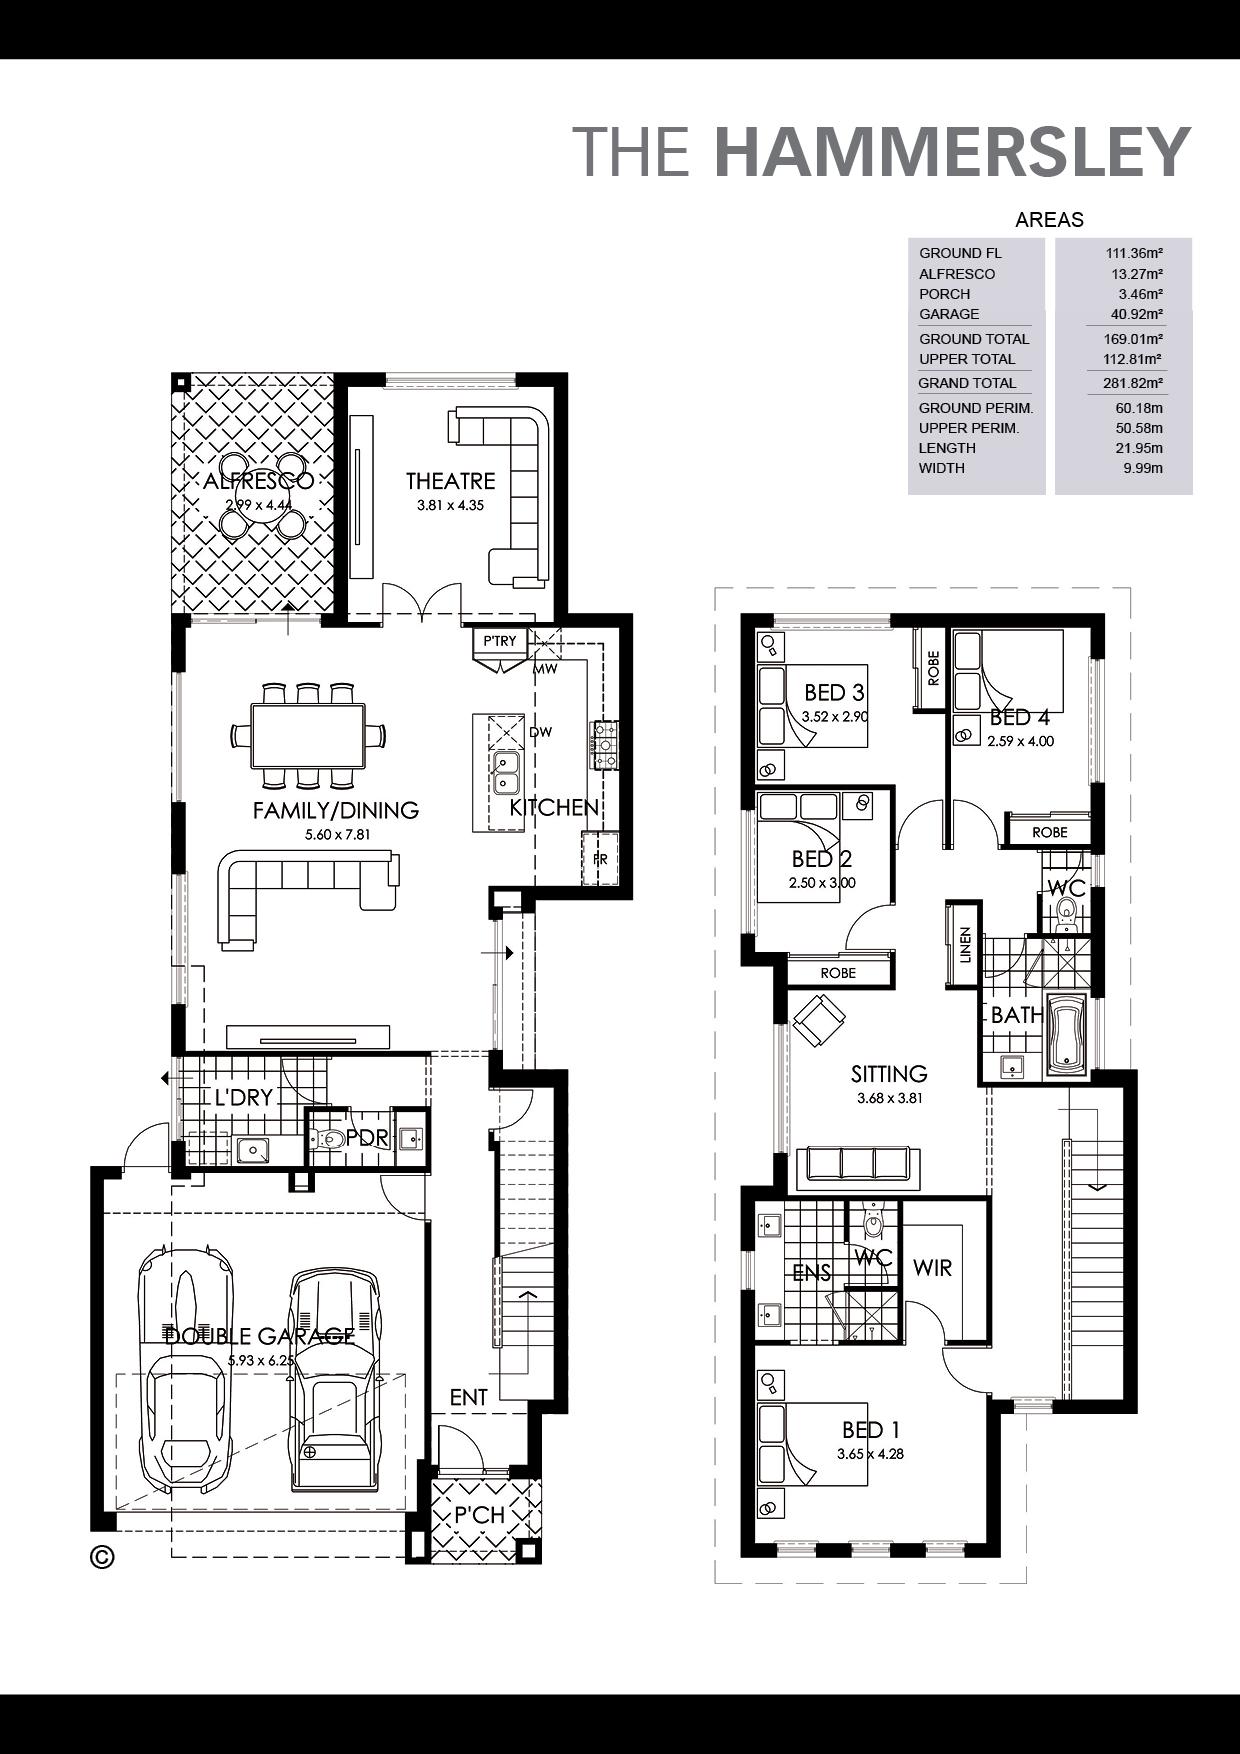 The Hamersley Floorplan